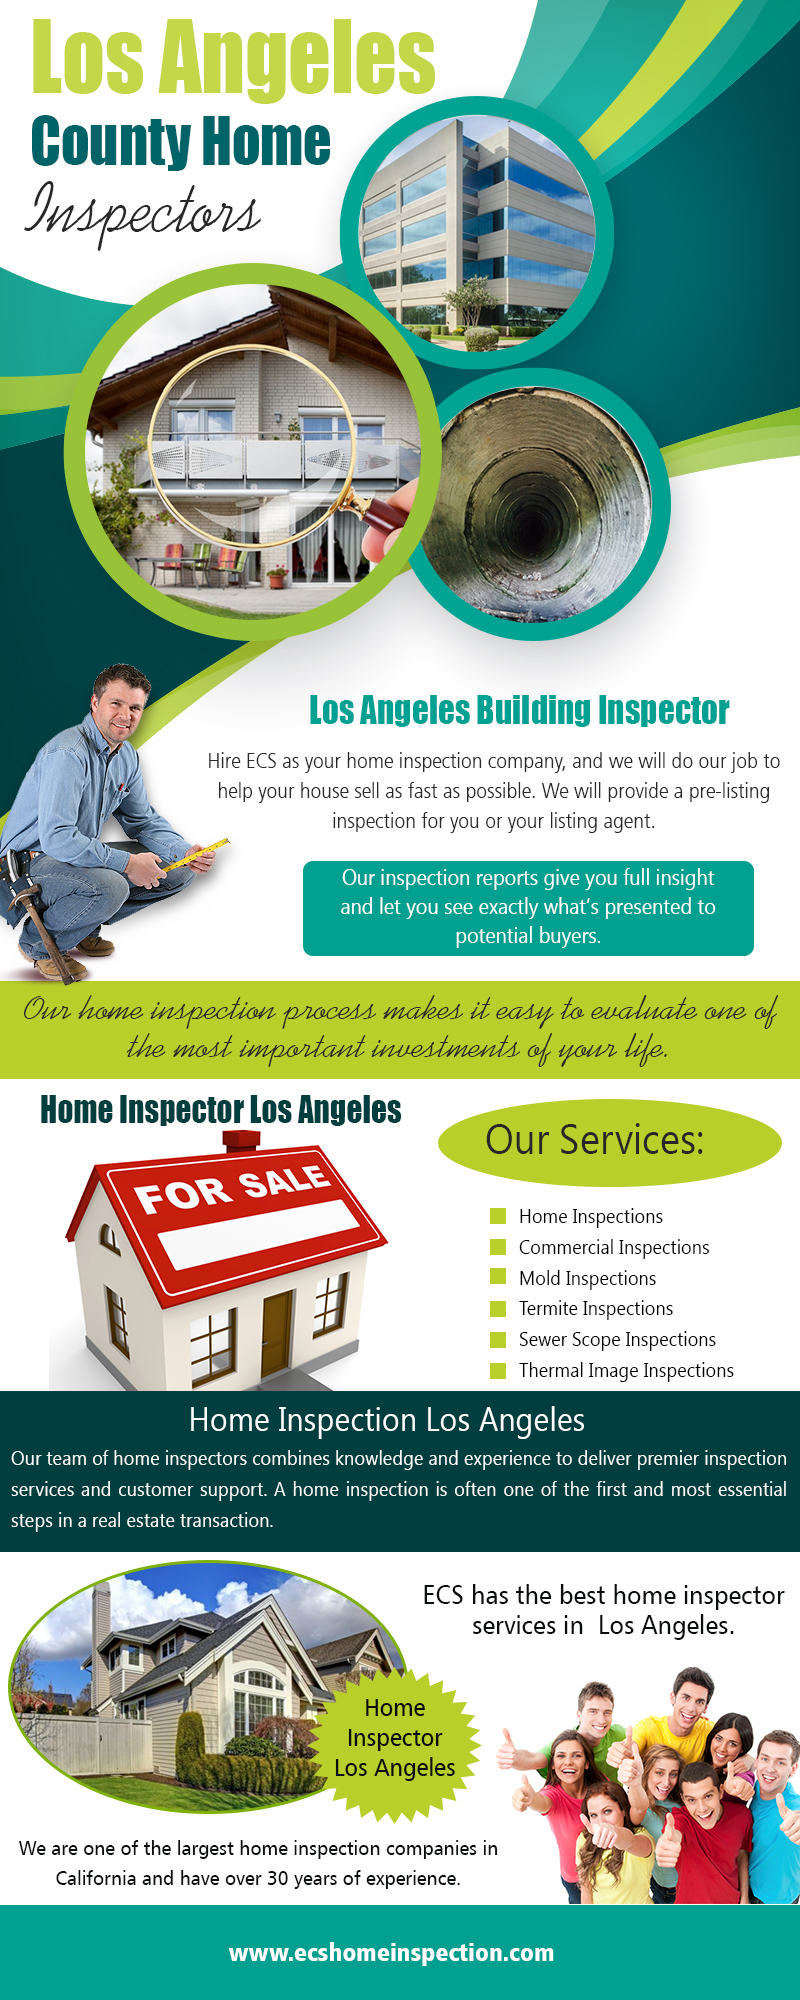 Los Angeles County Home Inspectors